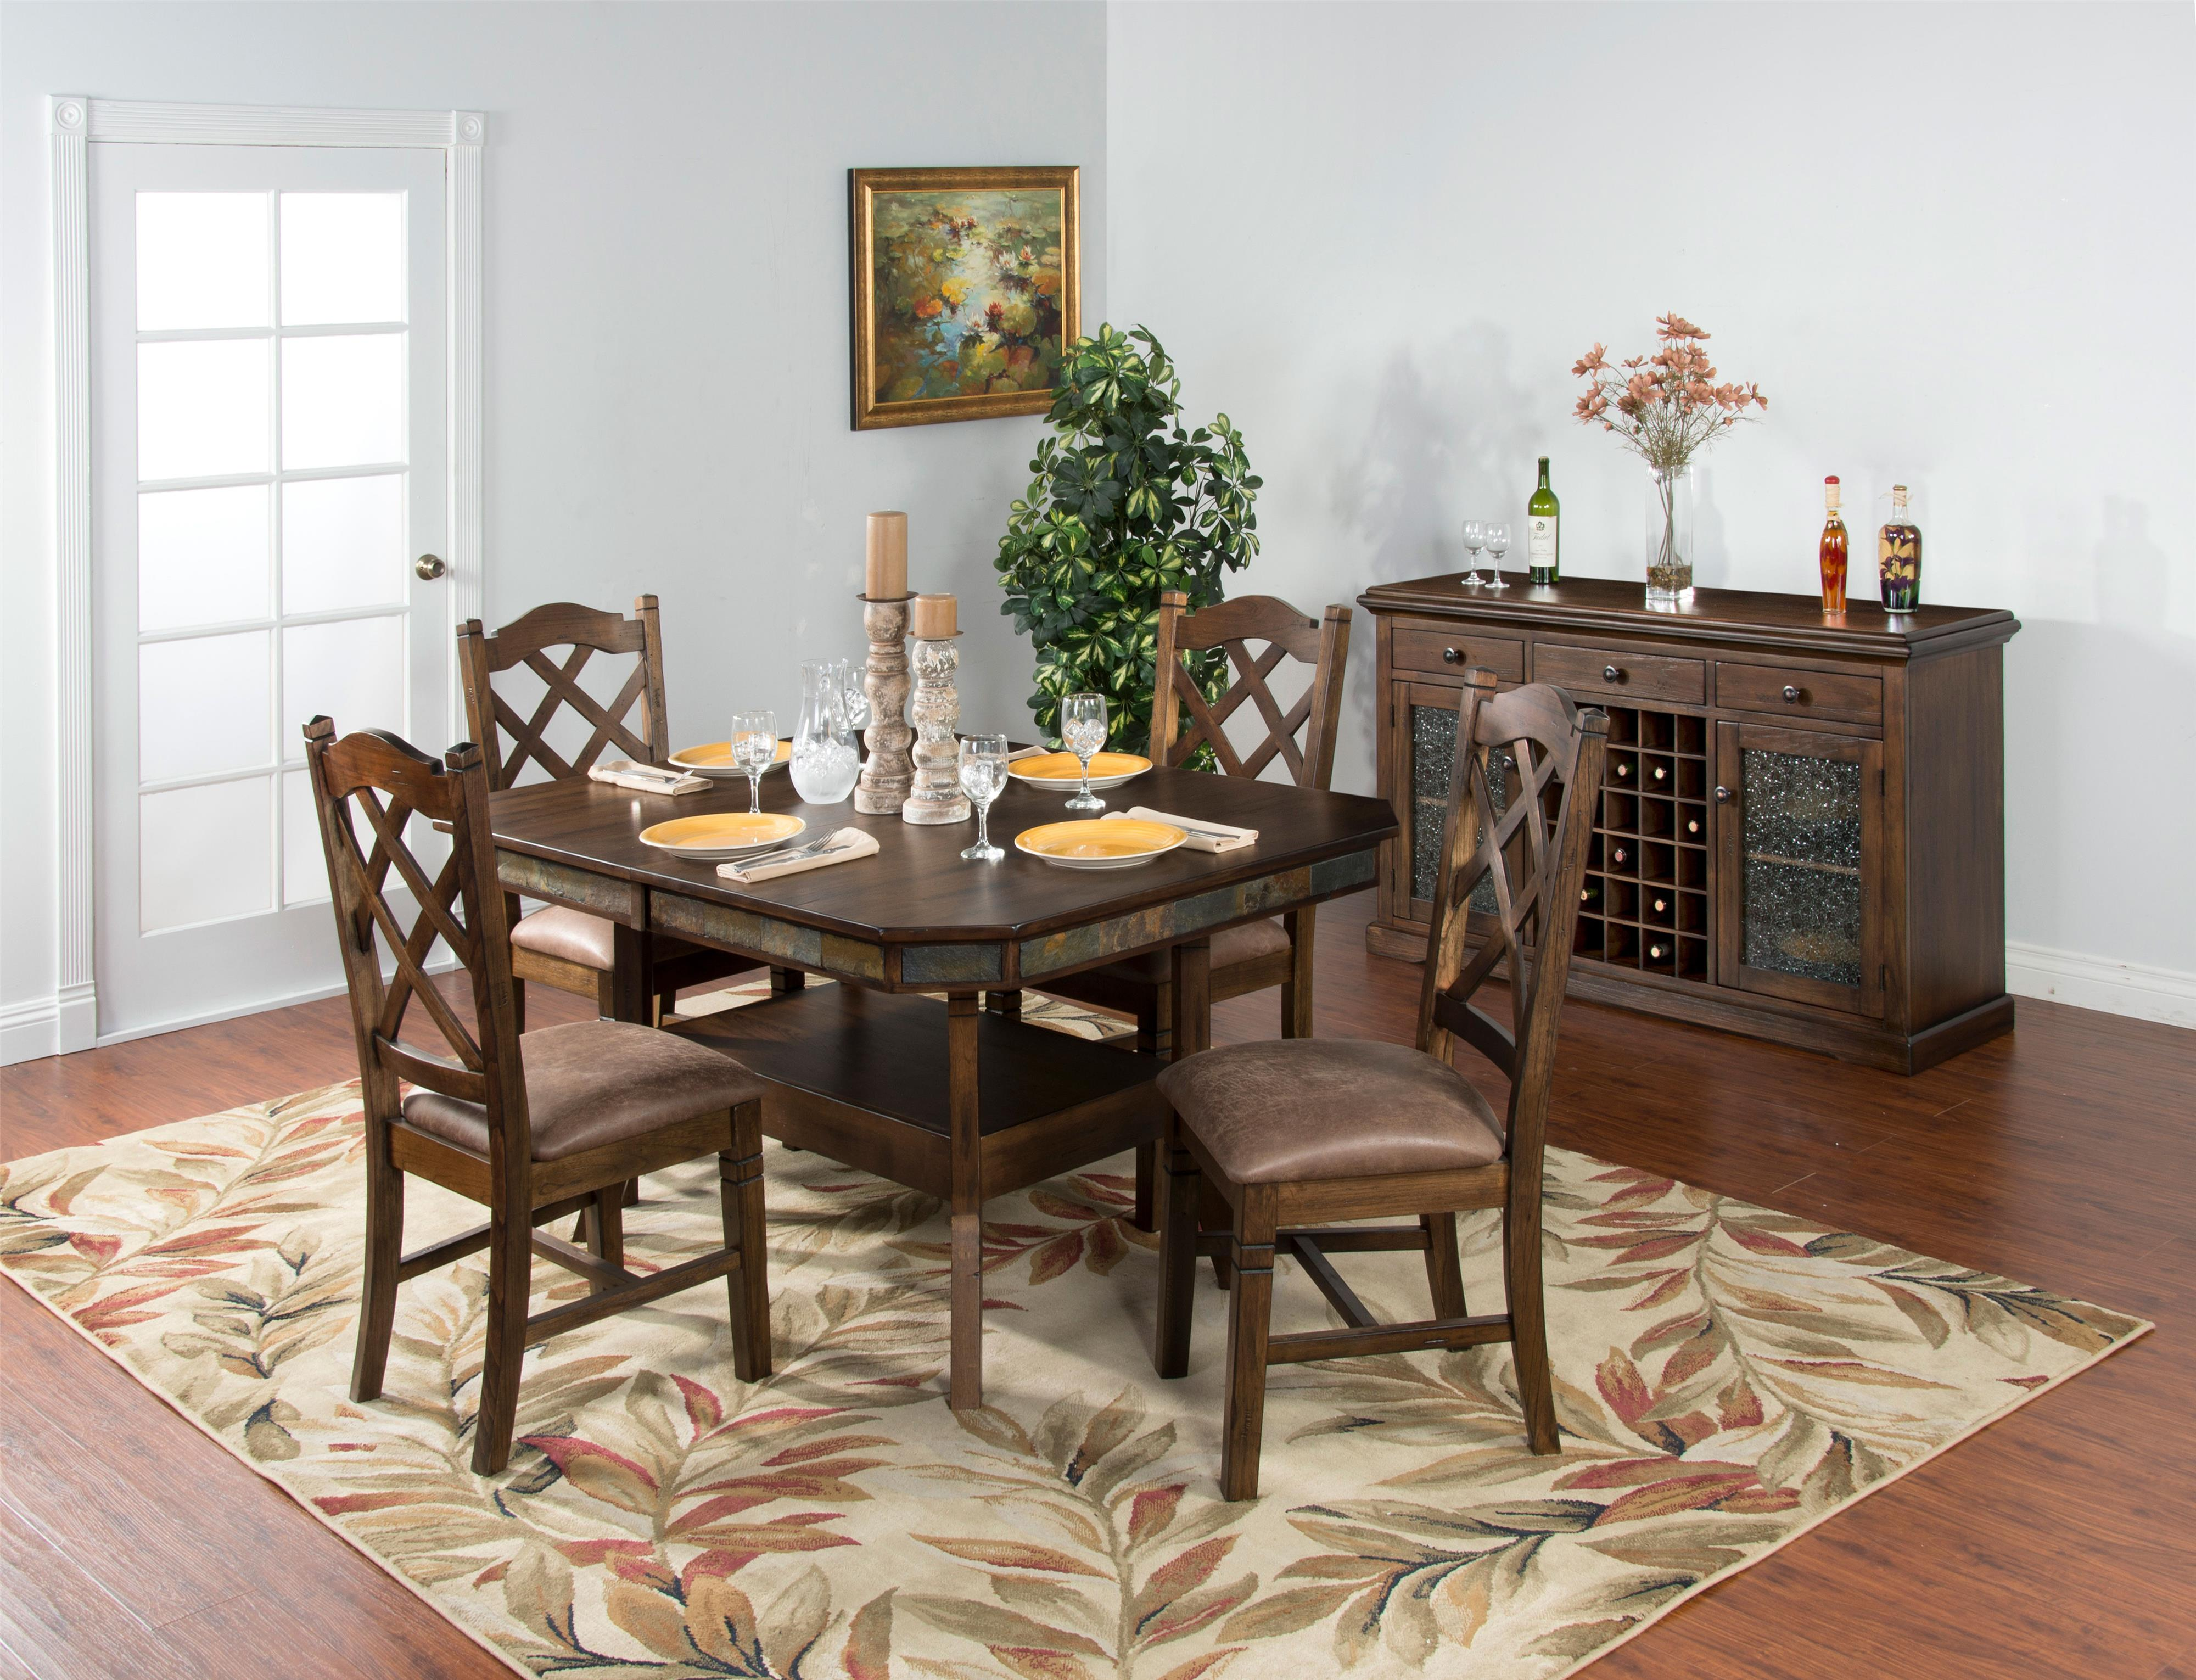 Sunny Designs Savannah Adjustable Height Dining Table w 2  : products2Fsunnydesigns2Fcolor2Fsavannah20ac1151ac b2 from www.fashionfurnitureco.com size 4000 x 3060 jpeg 1144kB